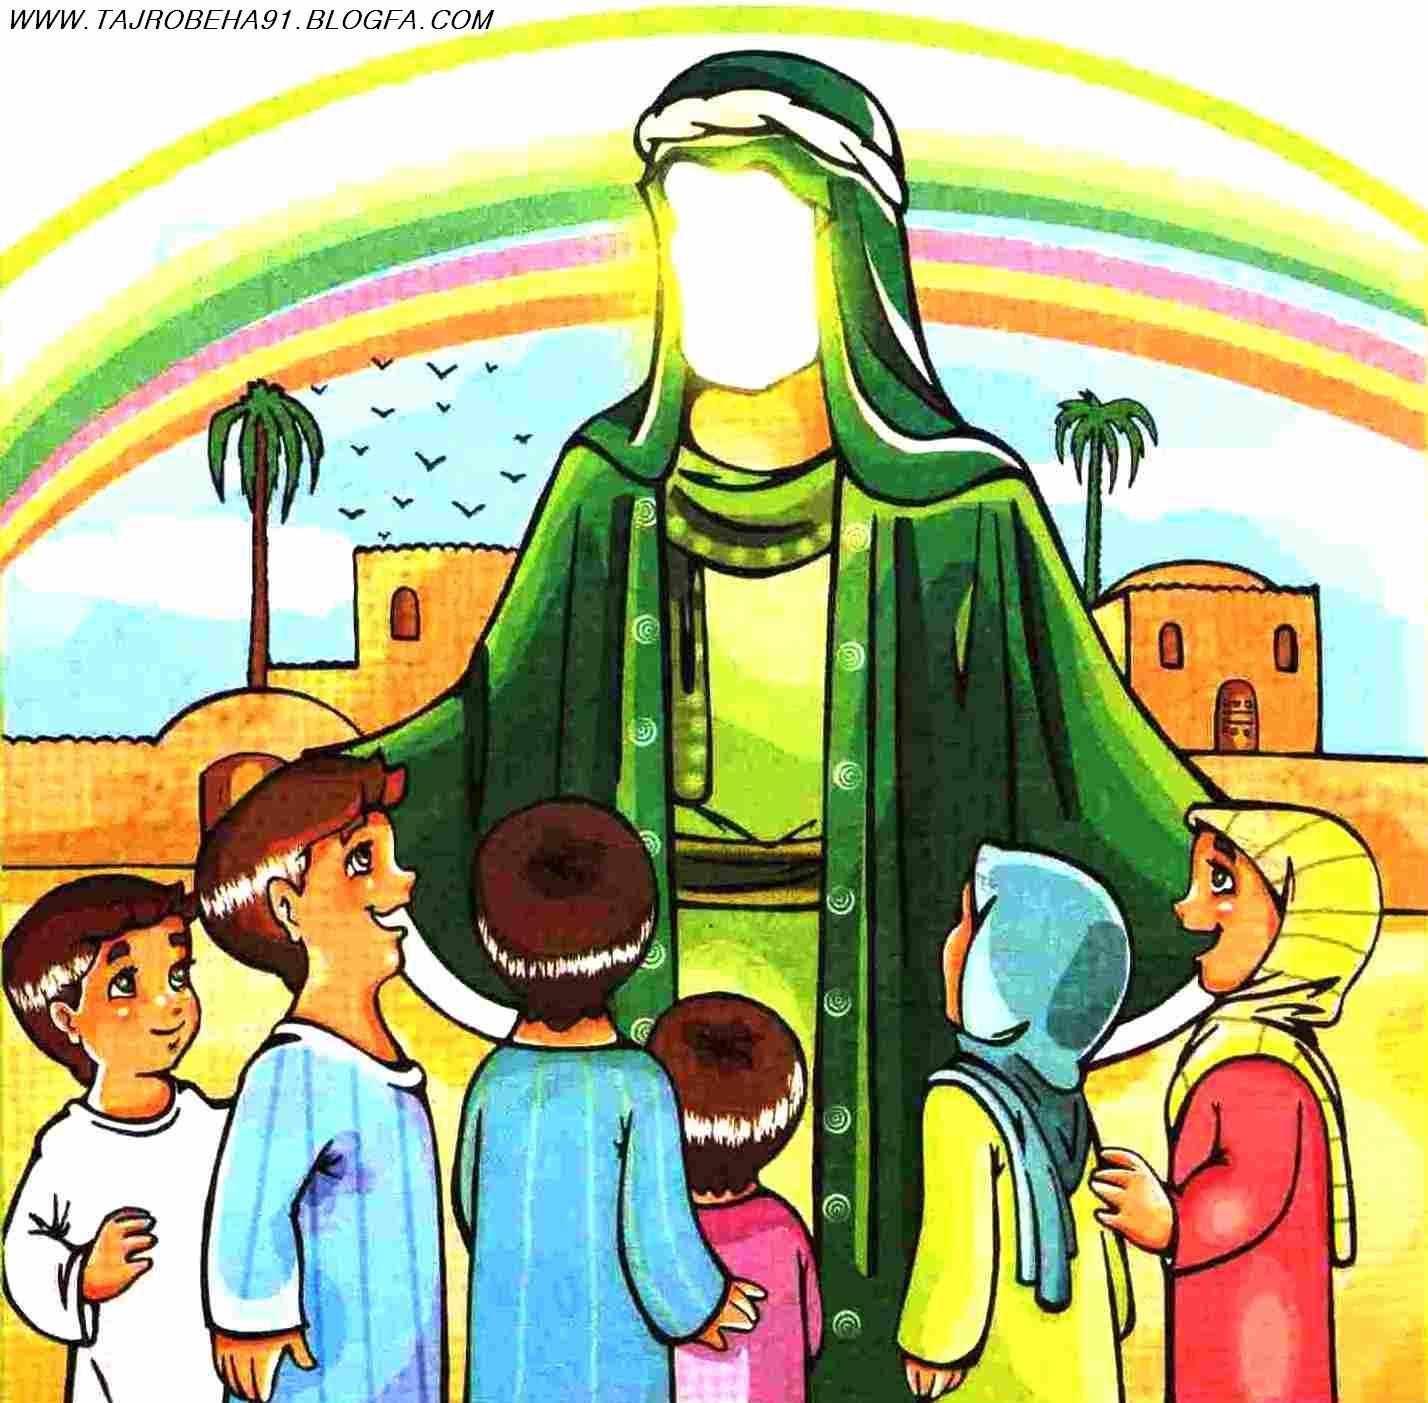 شعر کودکانه مذهبی 12 امام